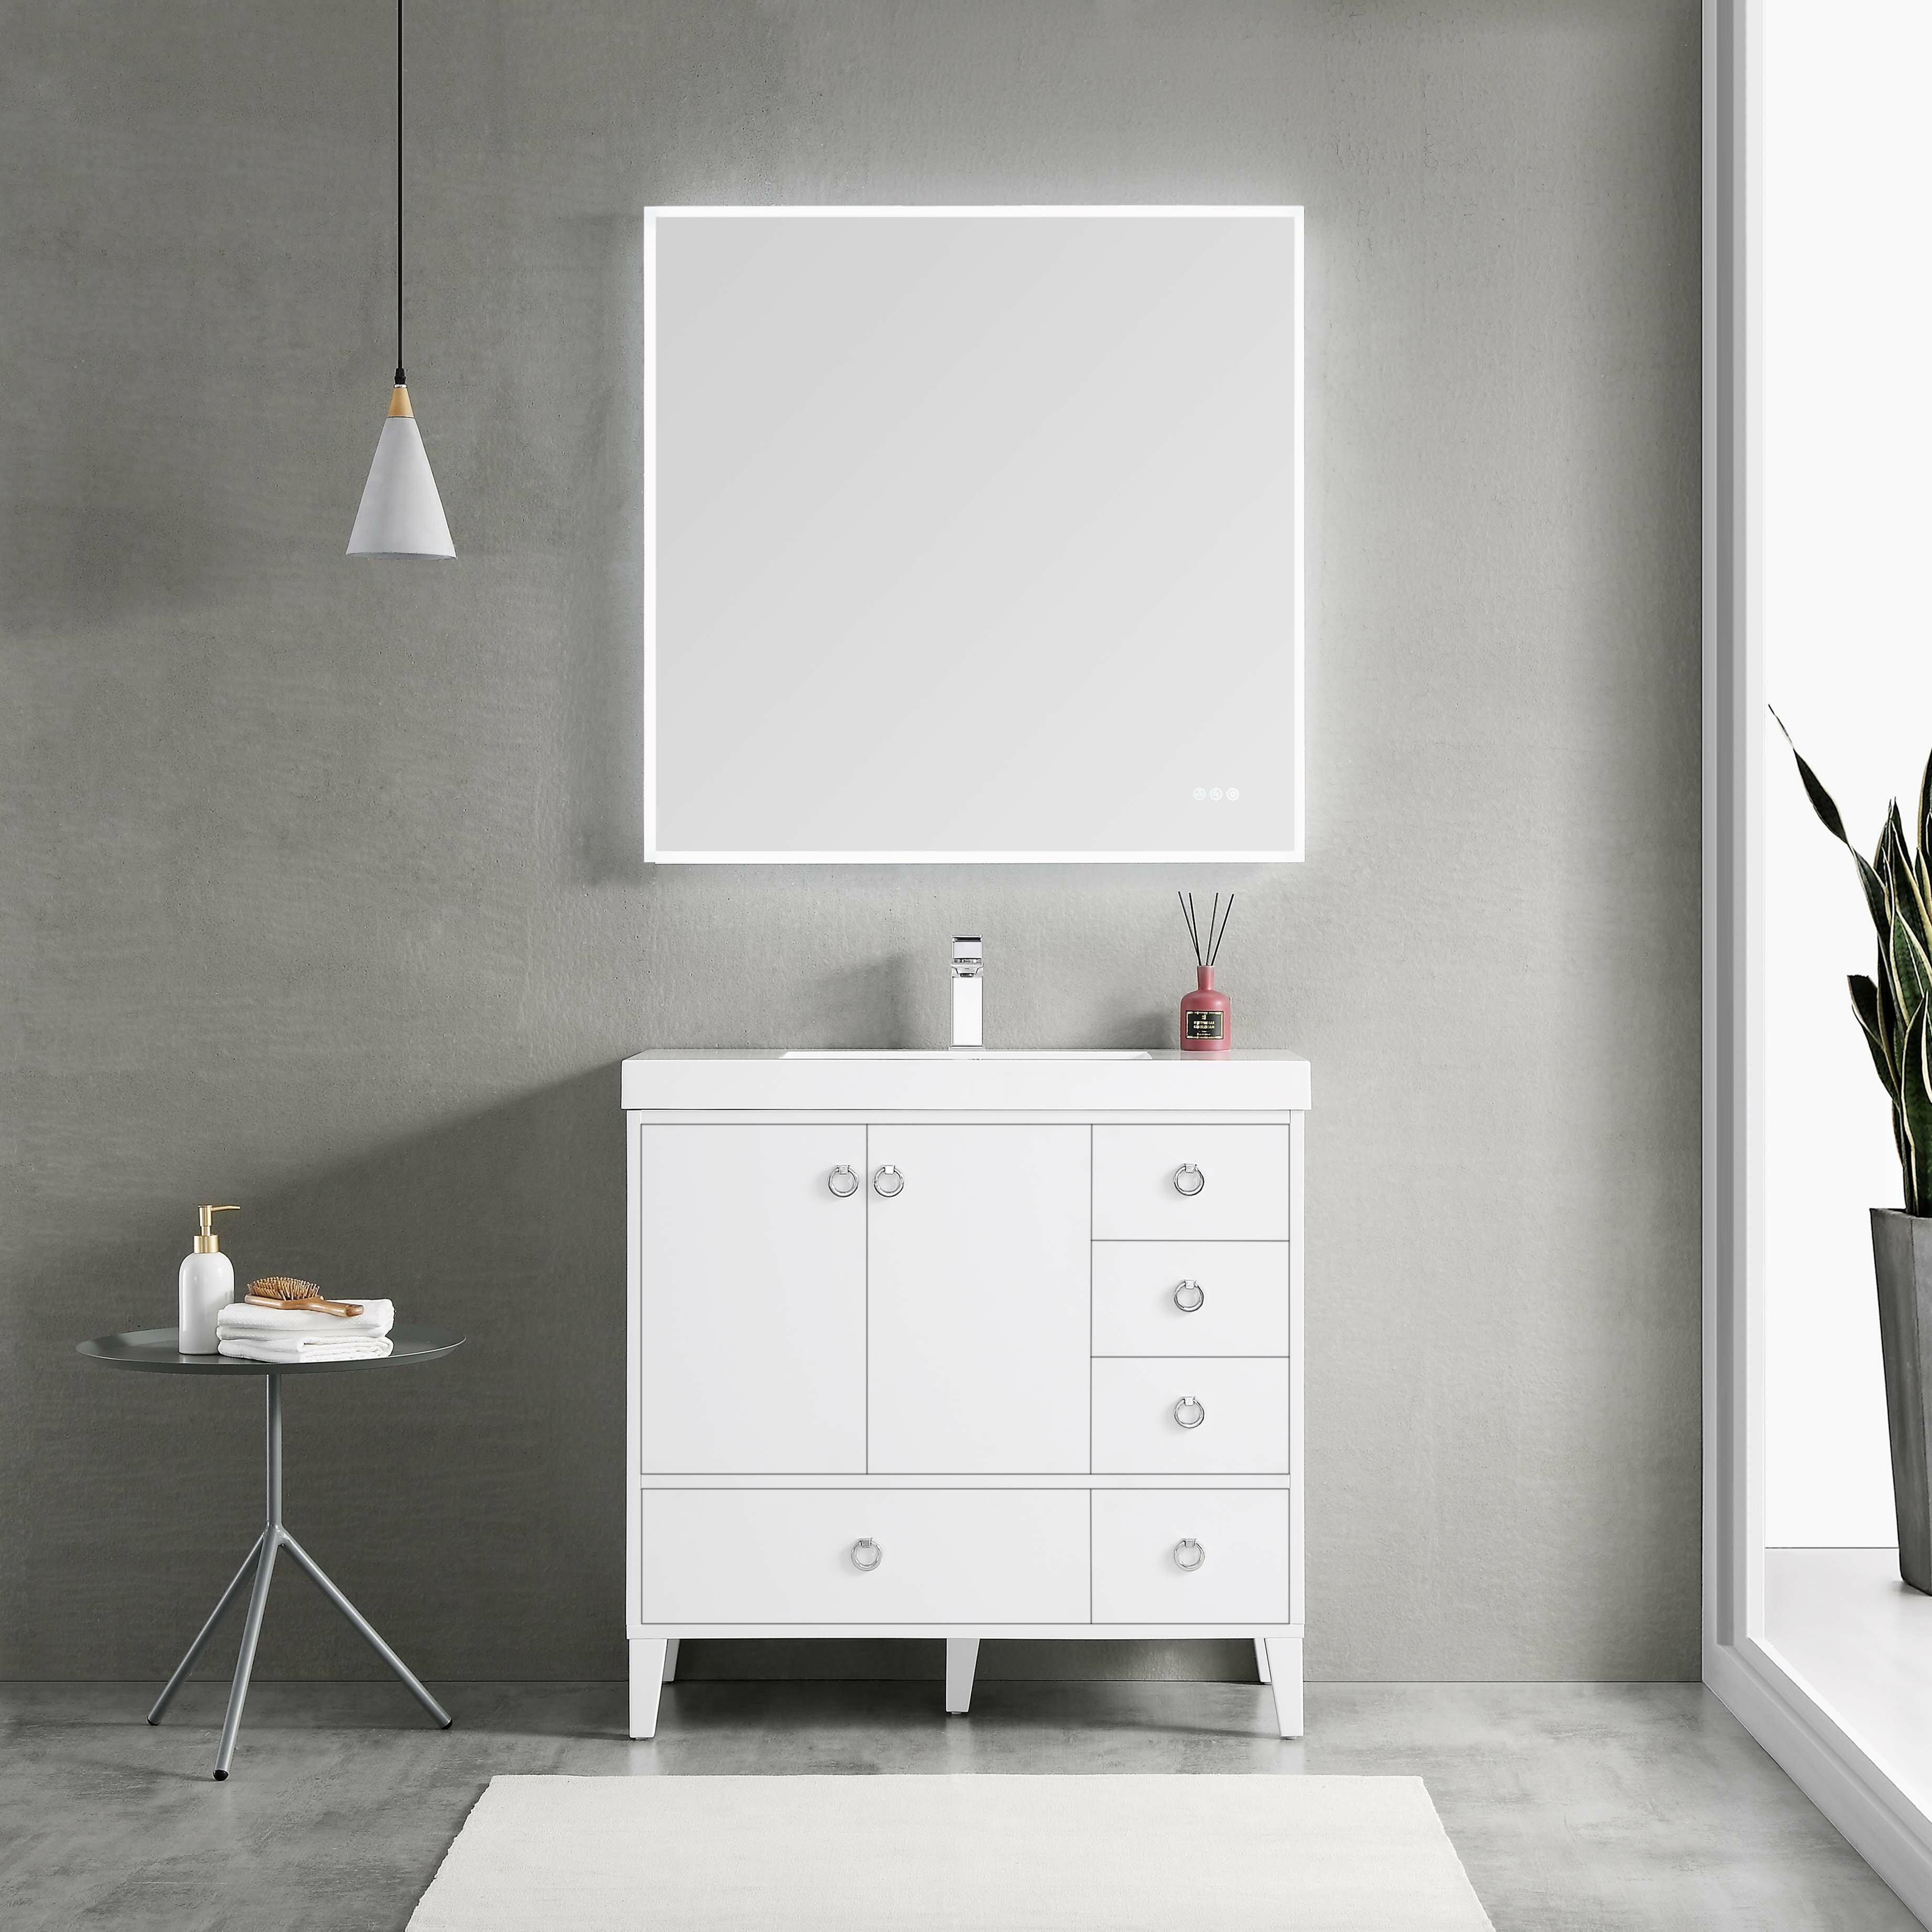 Ebern Designs Jez Waterproof Ergonomic Design 36 Single Bathroom Vanity Wayfair